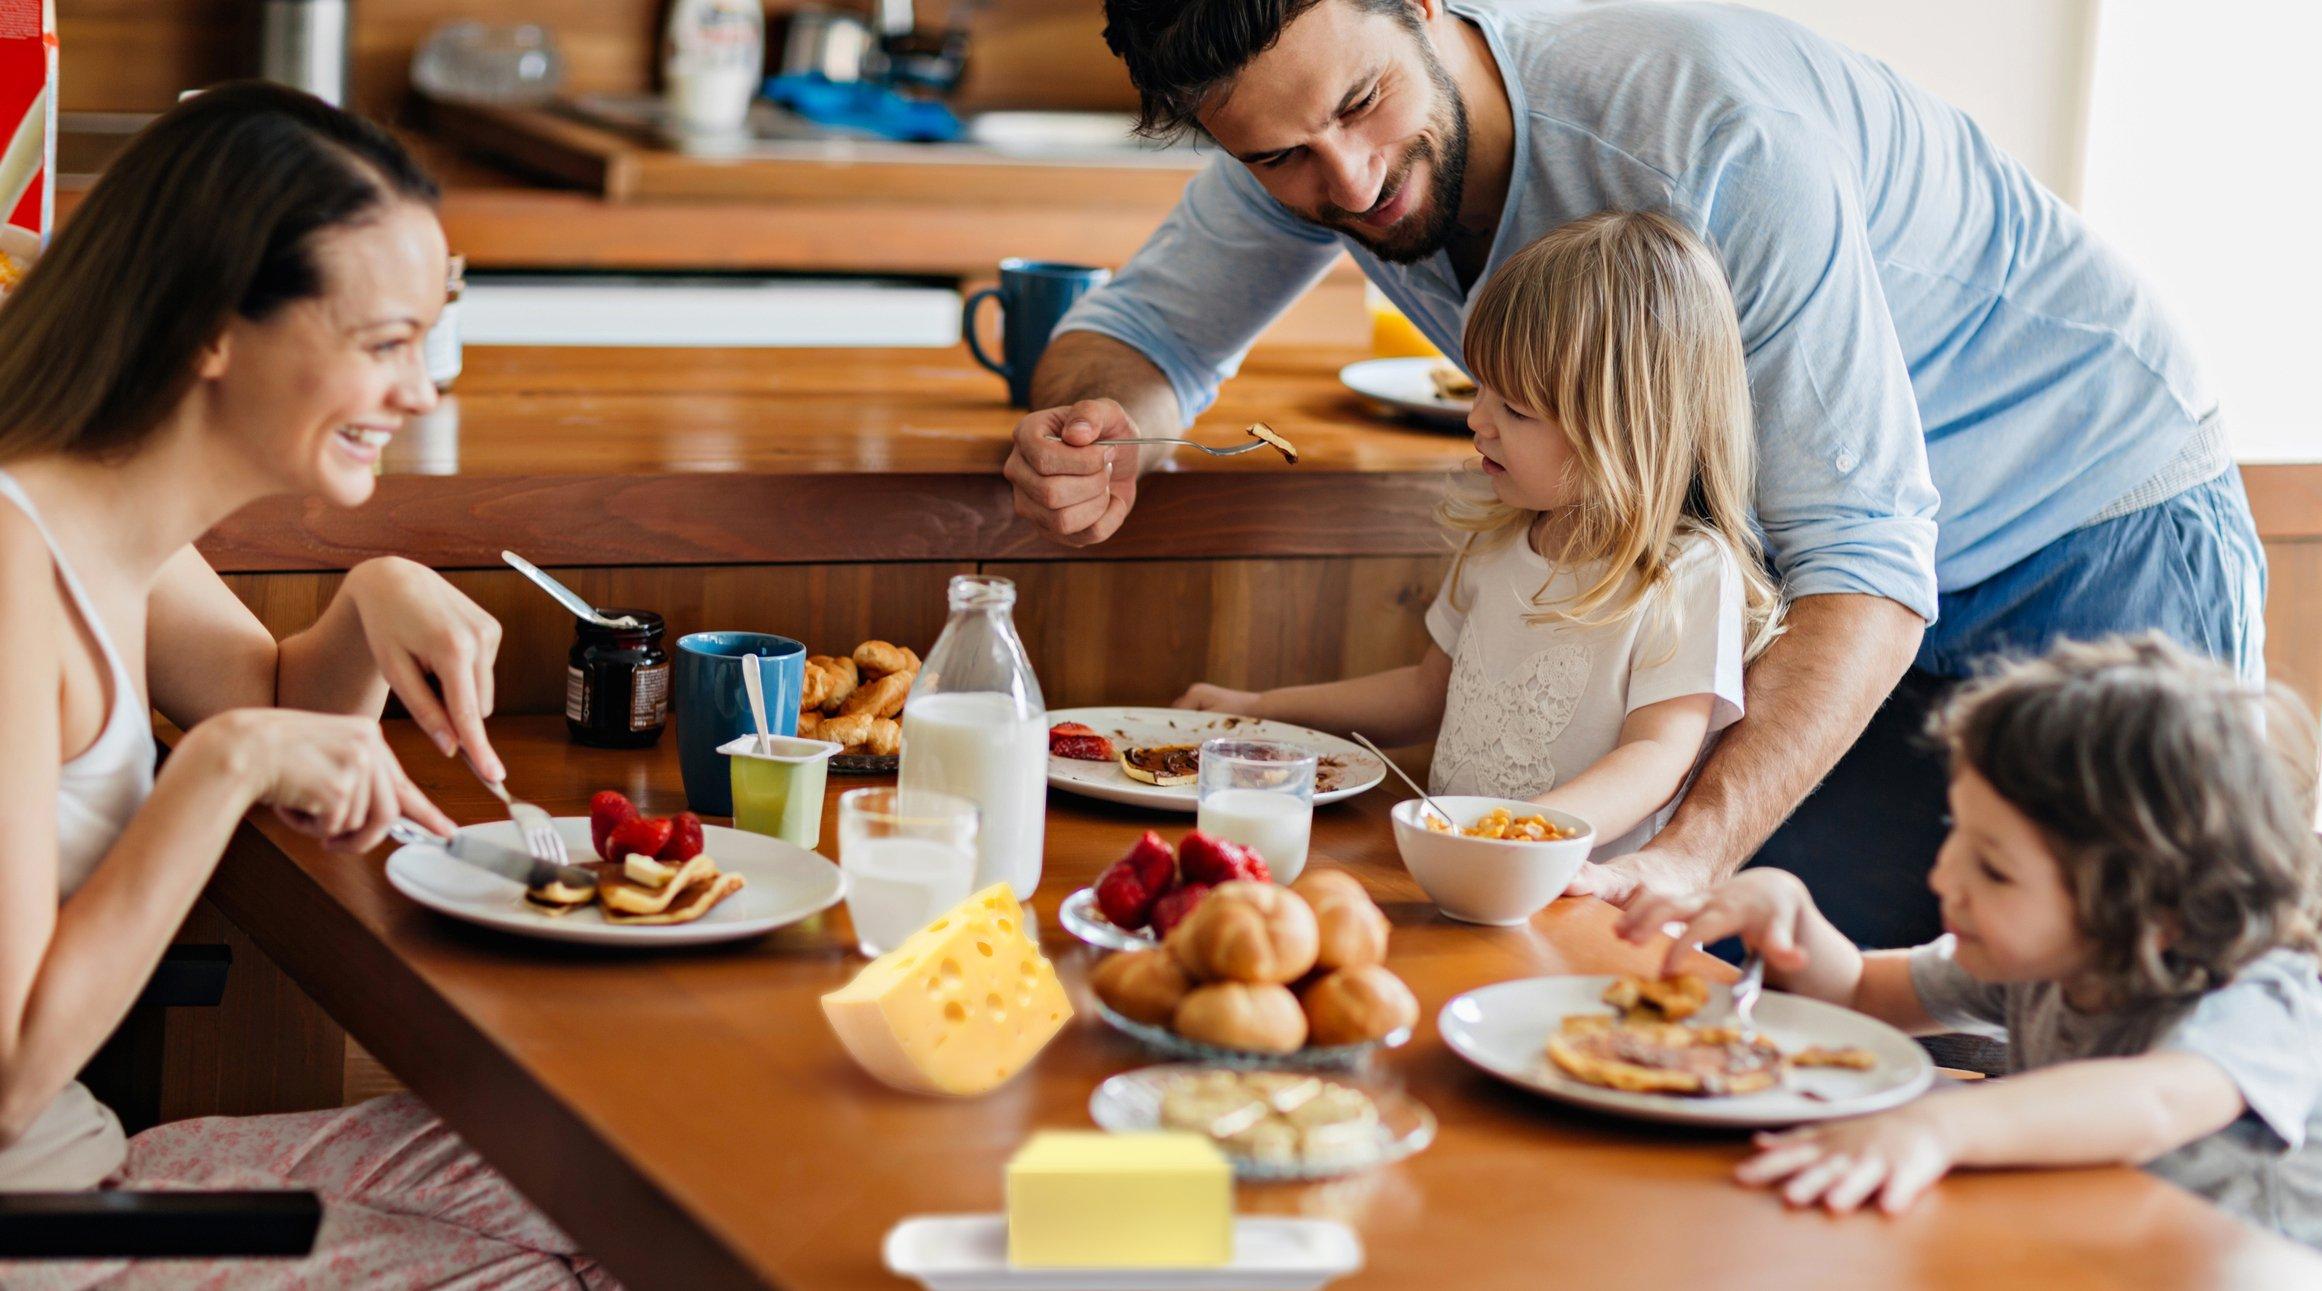 family eating breakfast - HD2322×1291